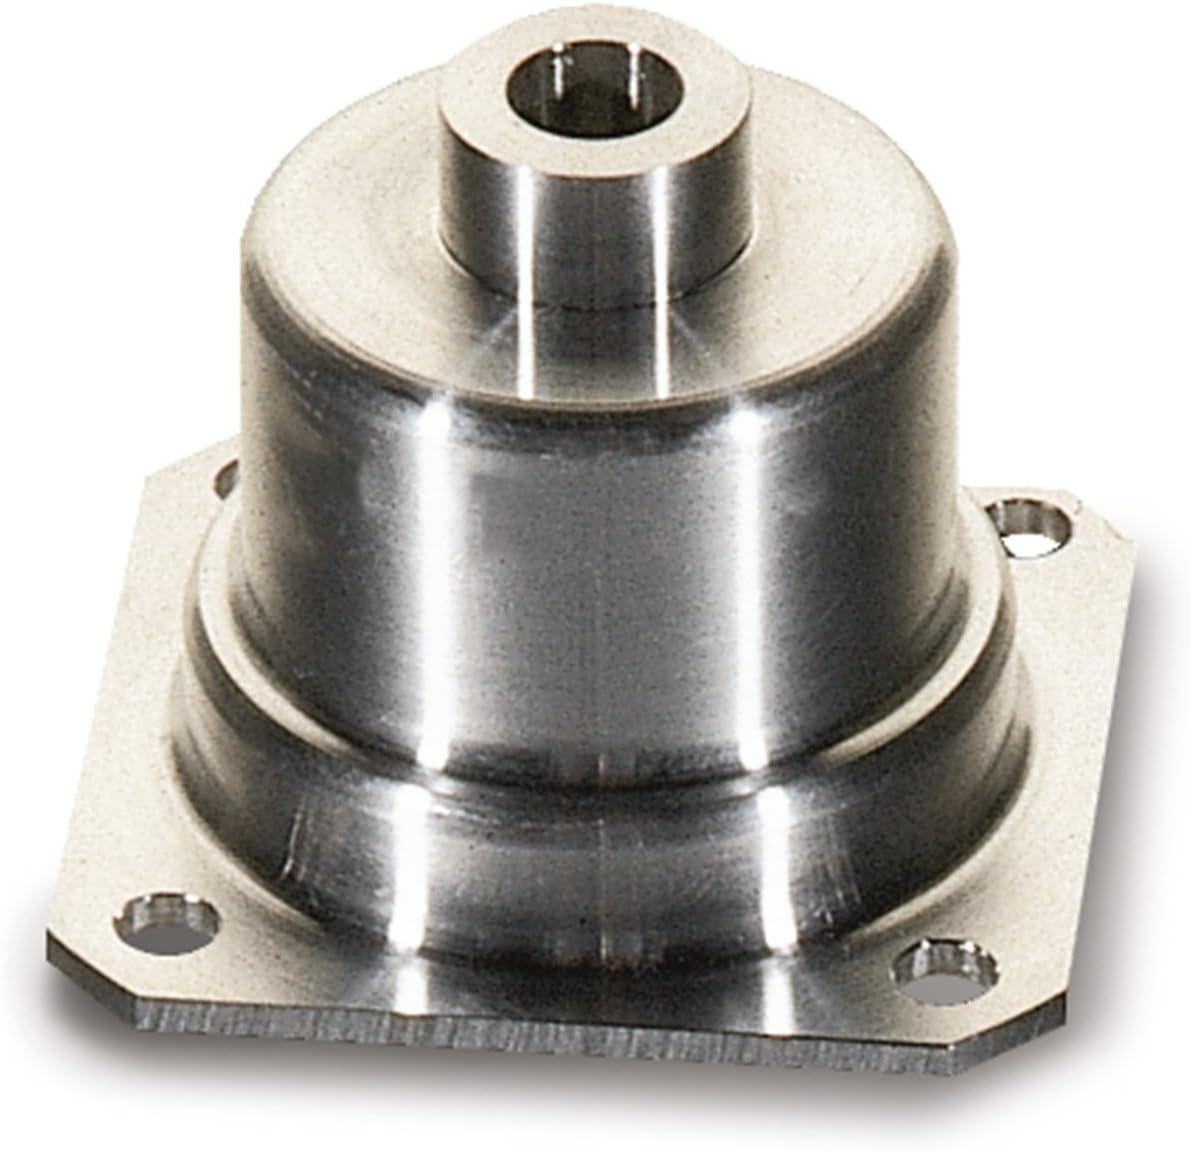 JET 61500 TBI Billet Aluminum Fuel Adjustable Animer and price revision Selling rankings Pressure Regulator